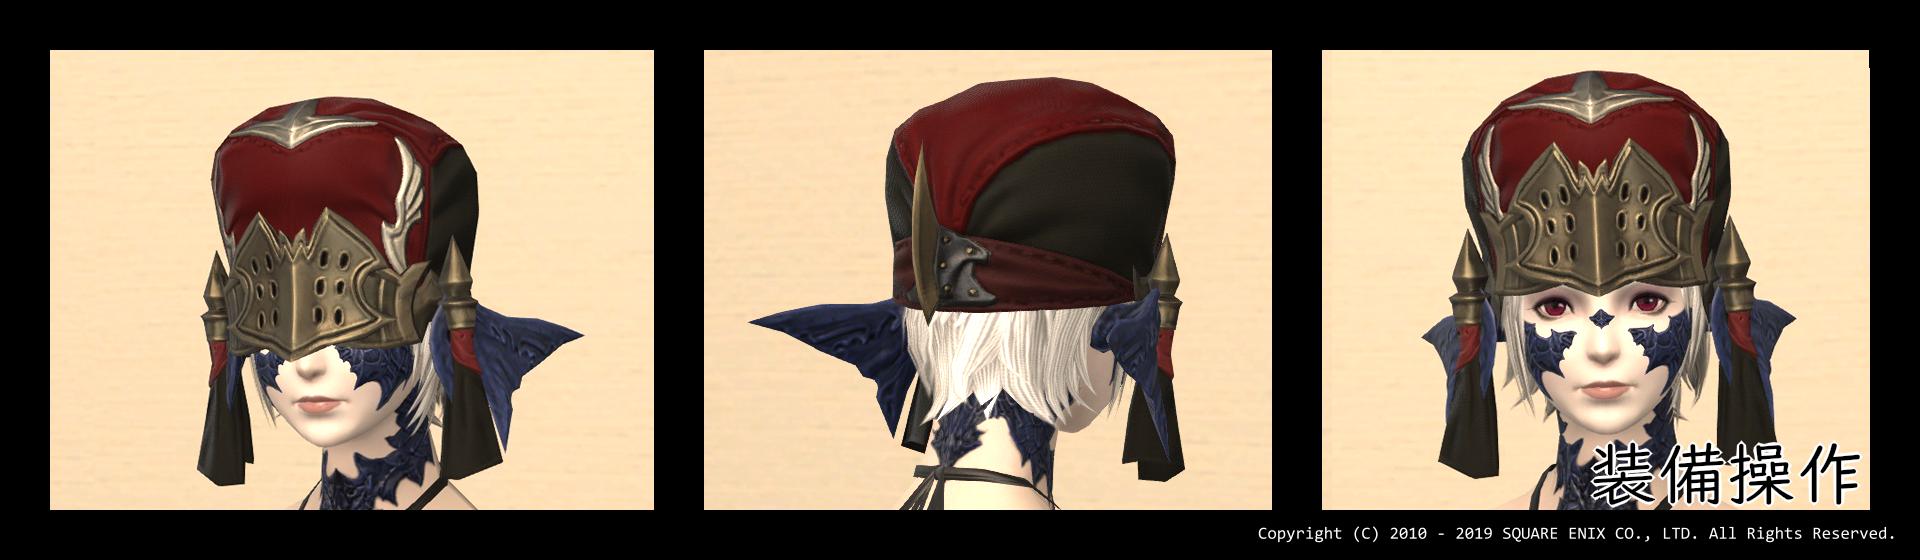 385c-blmsmnrdmblu-head